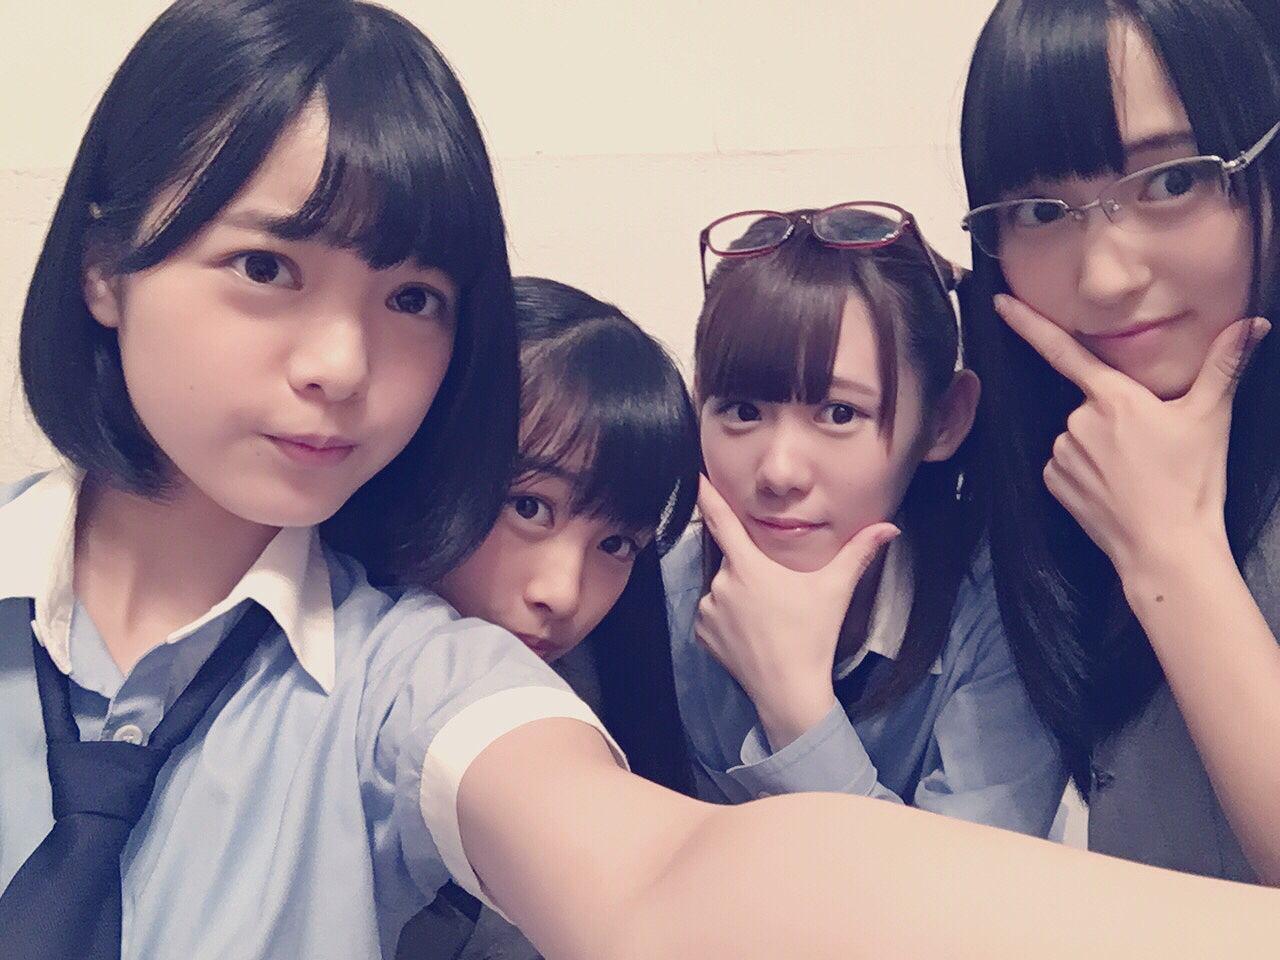 欅坂46・平手友梨奈、原田葵、小池美波、菅井友香の自撮り画像